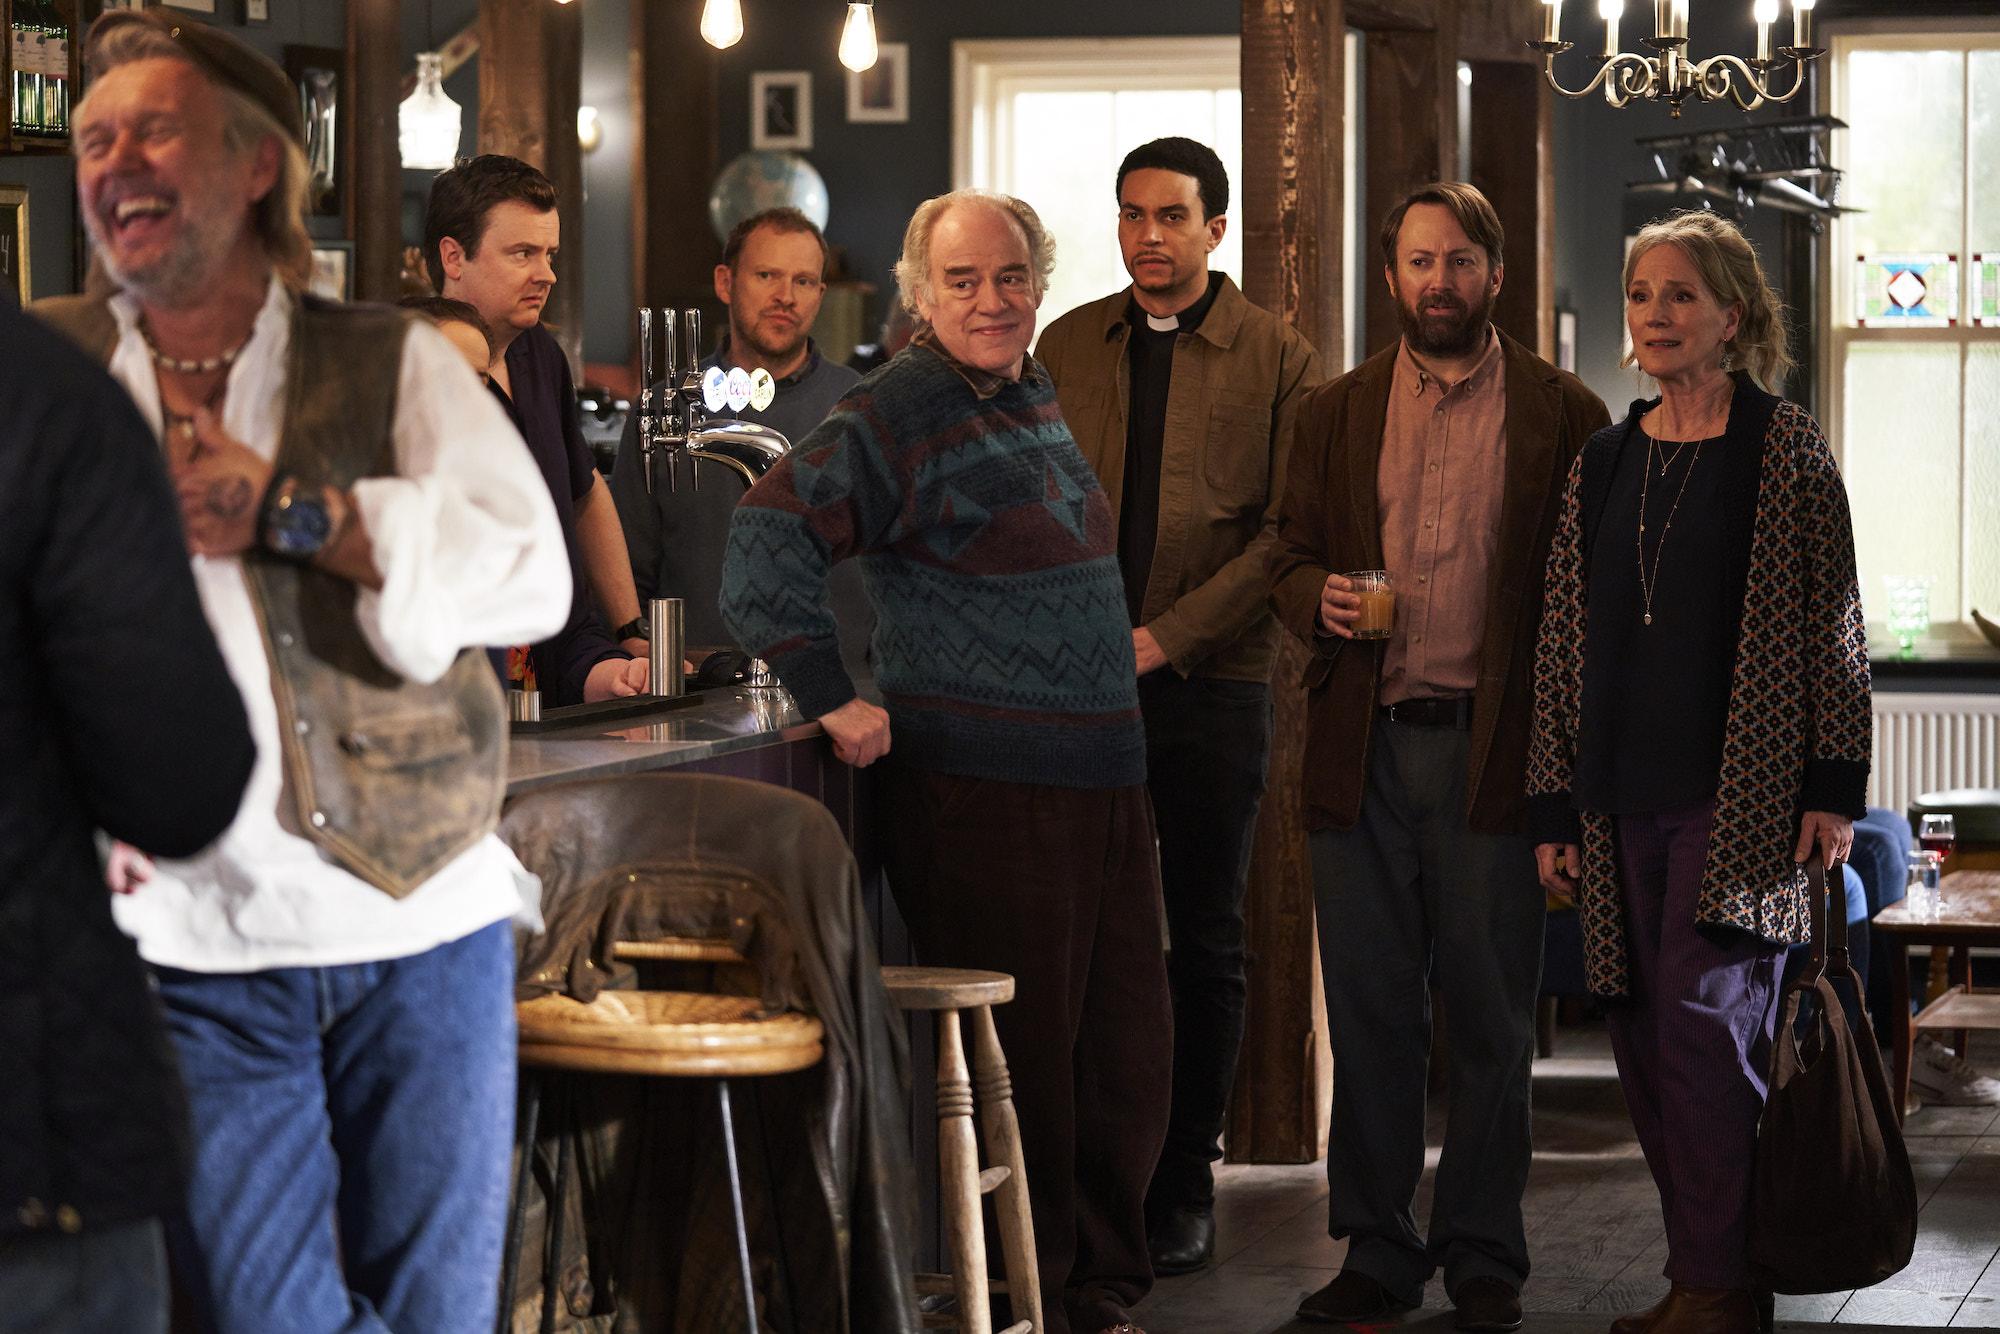 John Macmillan as Julian, Geoff McGivern as Uncle Geoff, Penny Downie as Ellen, Robert Webb as Andrew, David Mitchell as Stephen - Back _ Season 2, Episode 2 - Photo Credit: Sundance Now